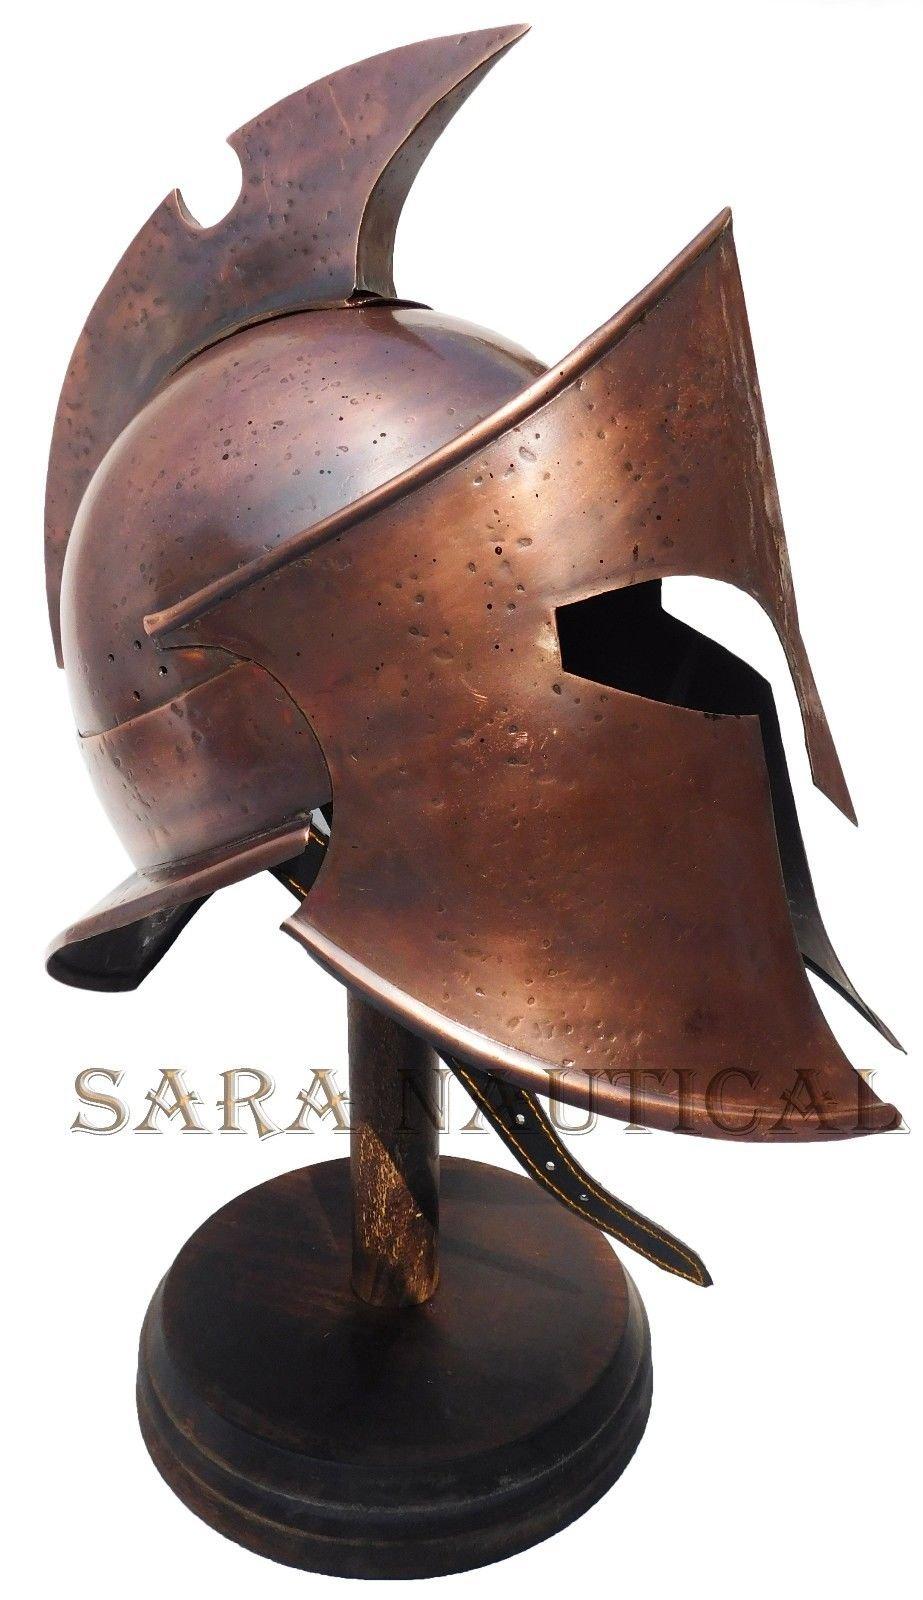 All Metal 300 Spartan Helmet Metal Collectible Decorative Antique Item Halloween Helmet by Expressions Enterprises (Image #1)